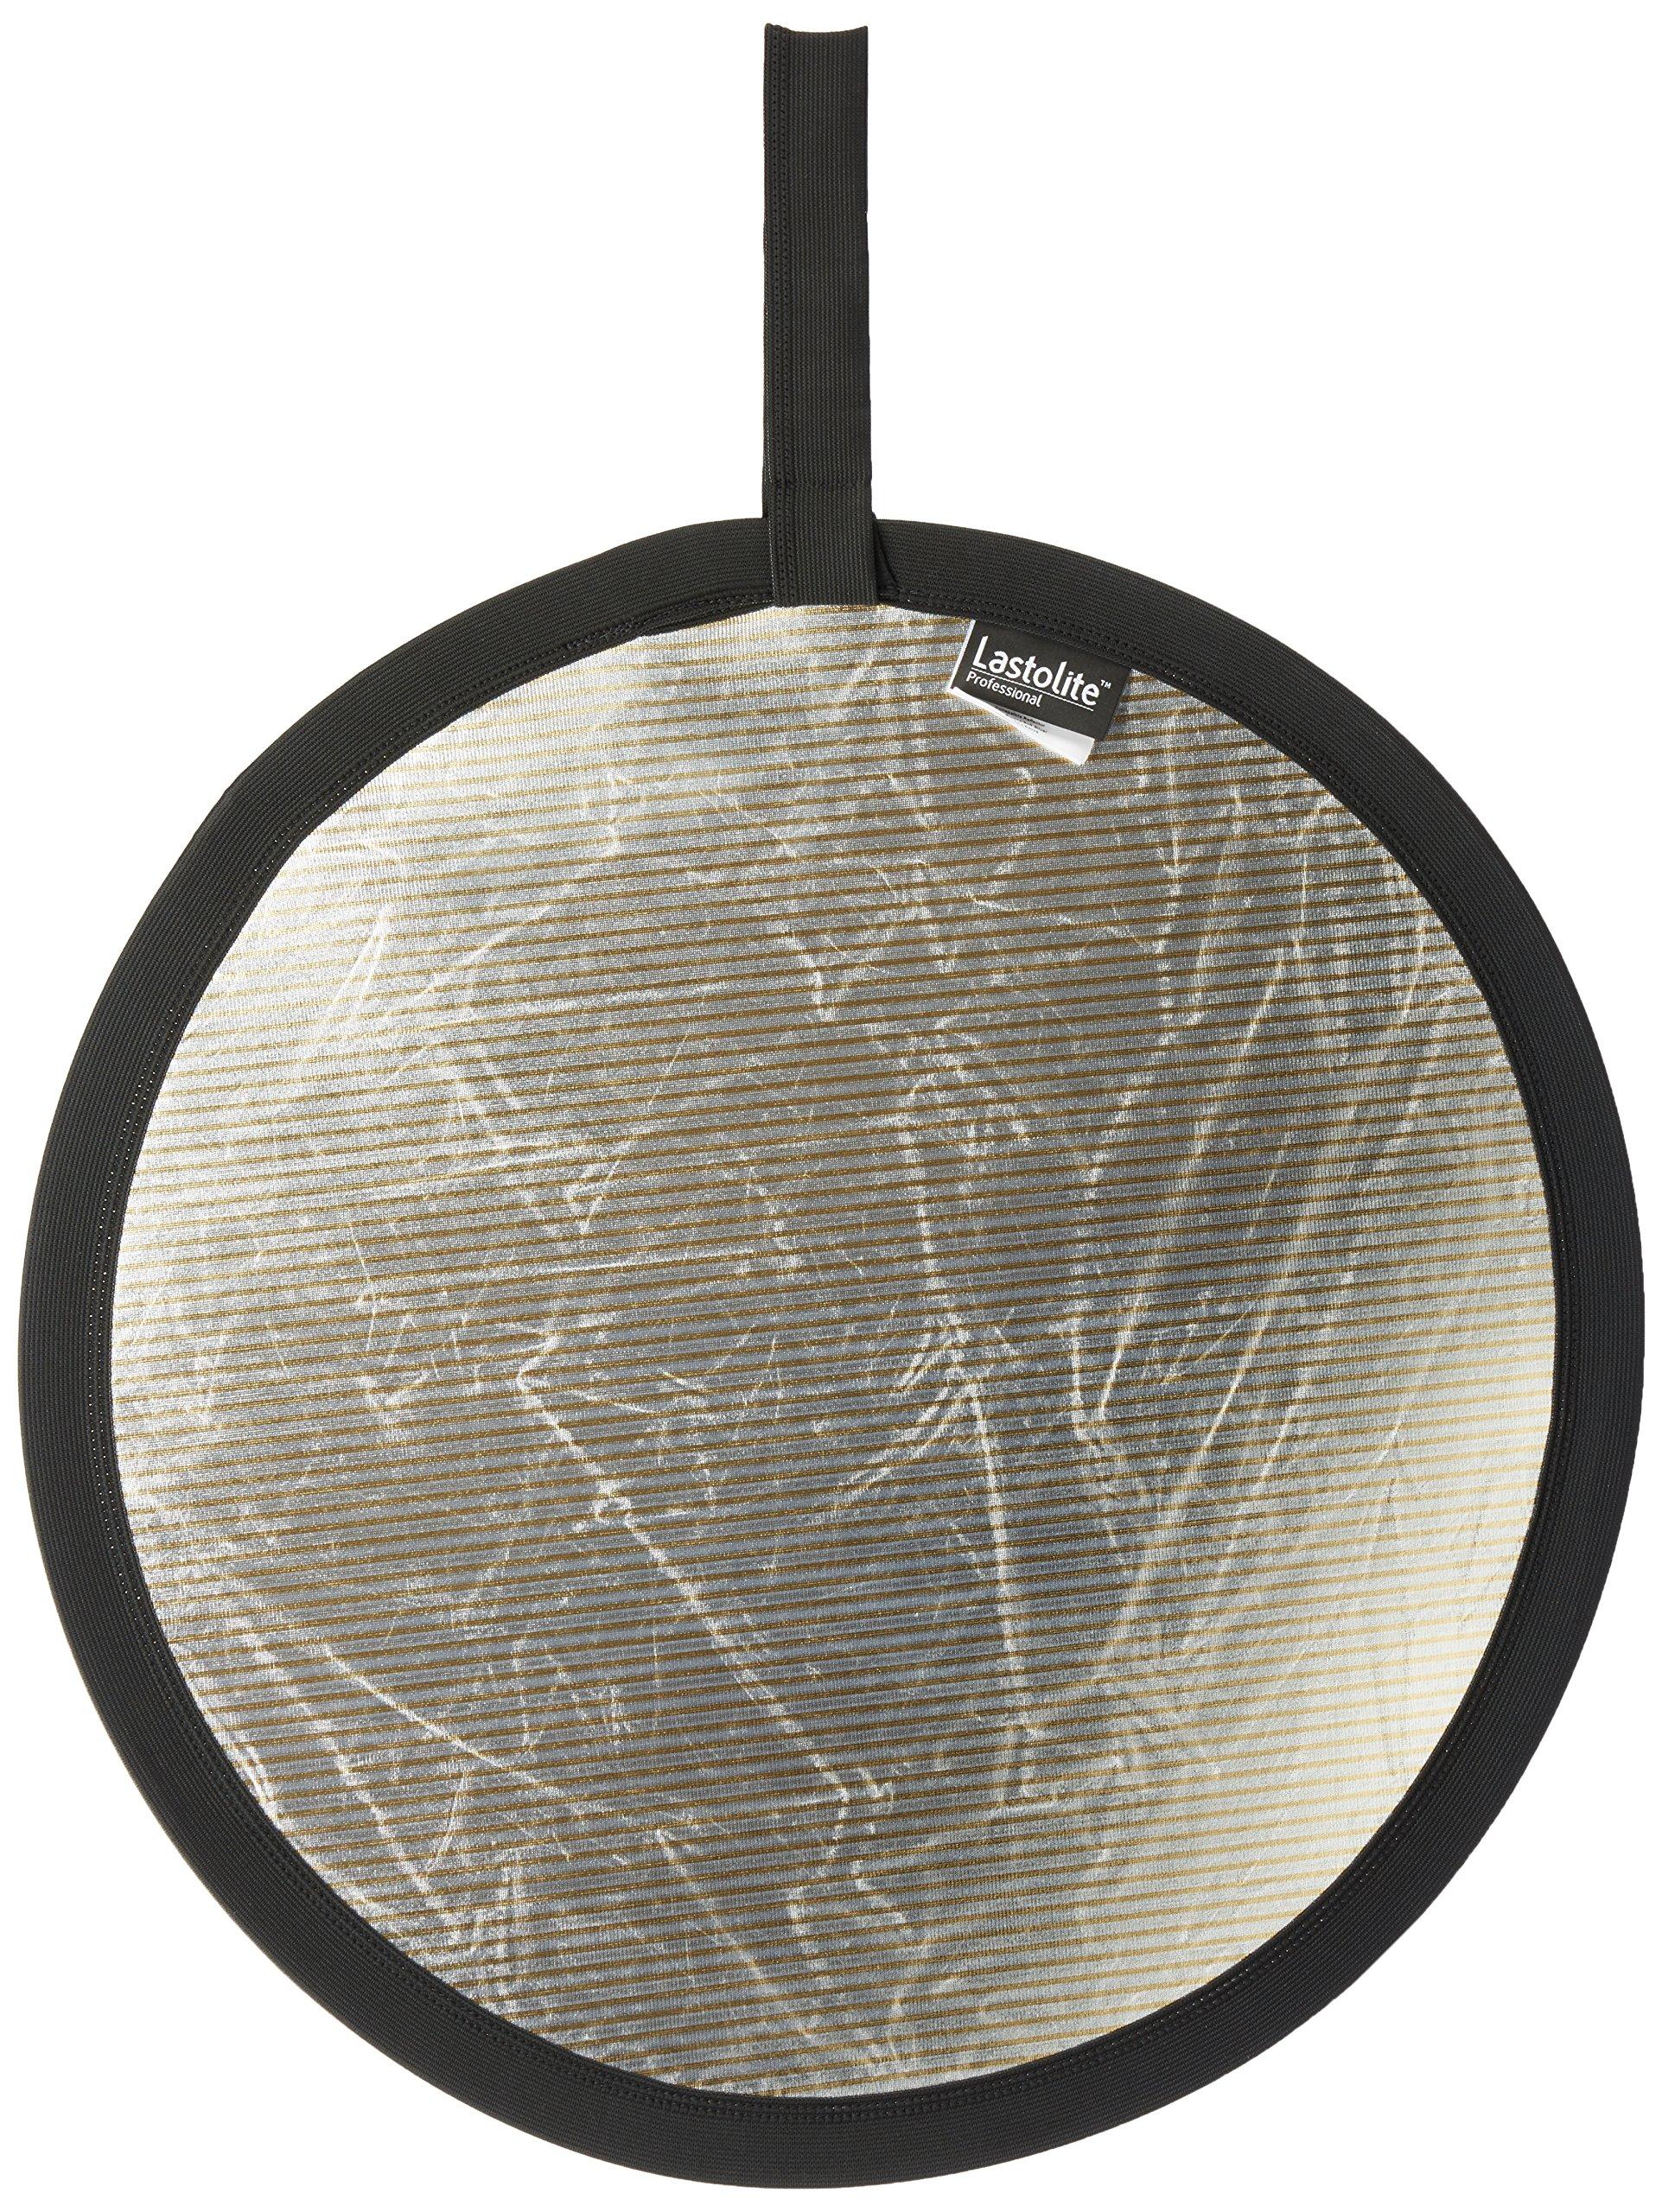 Lastolite Collapsible Reflector - 20'' Circular - Sunlite/Soft Silver